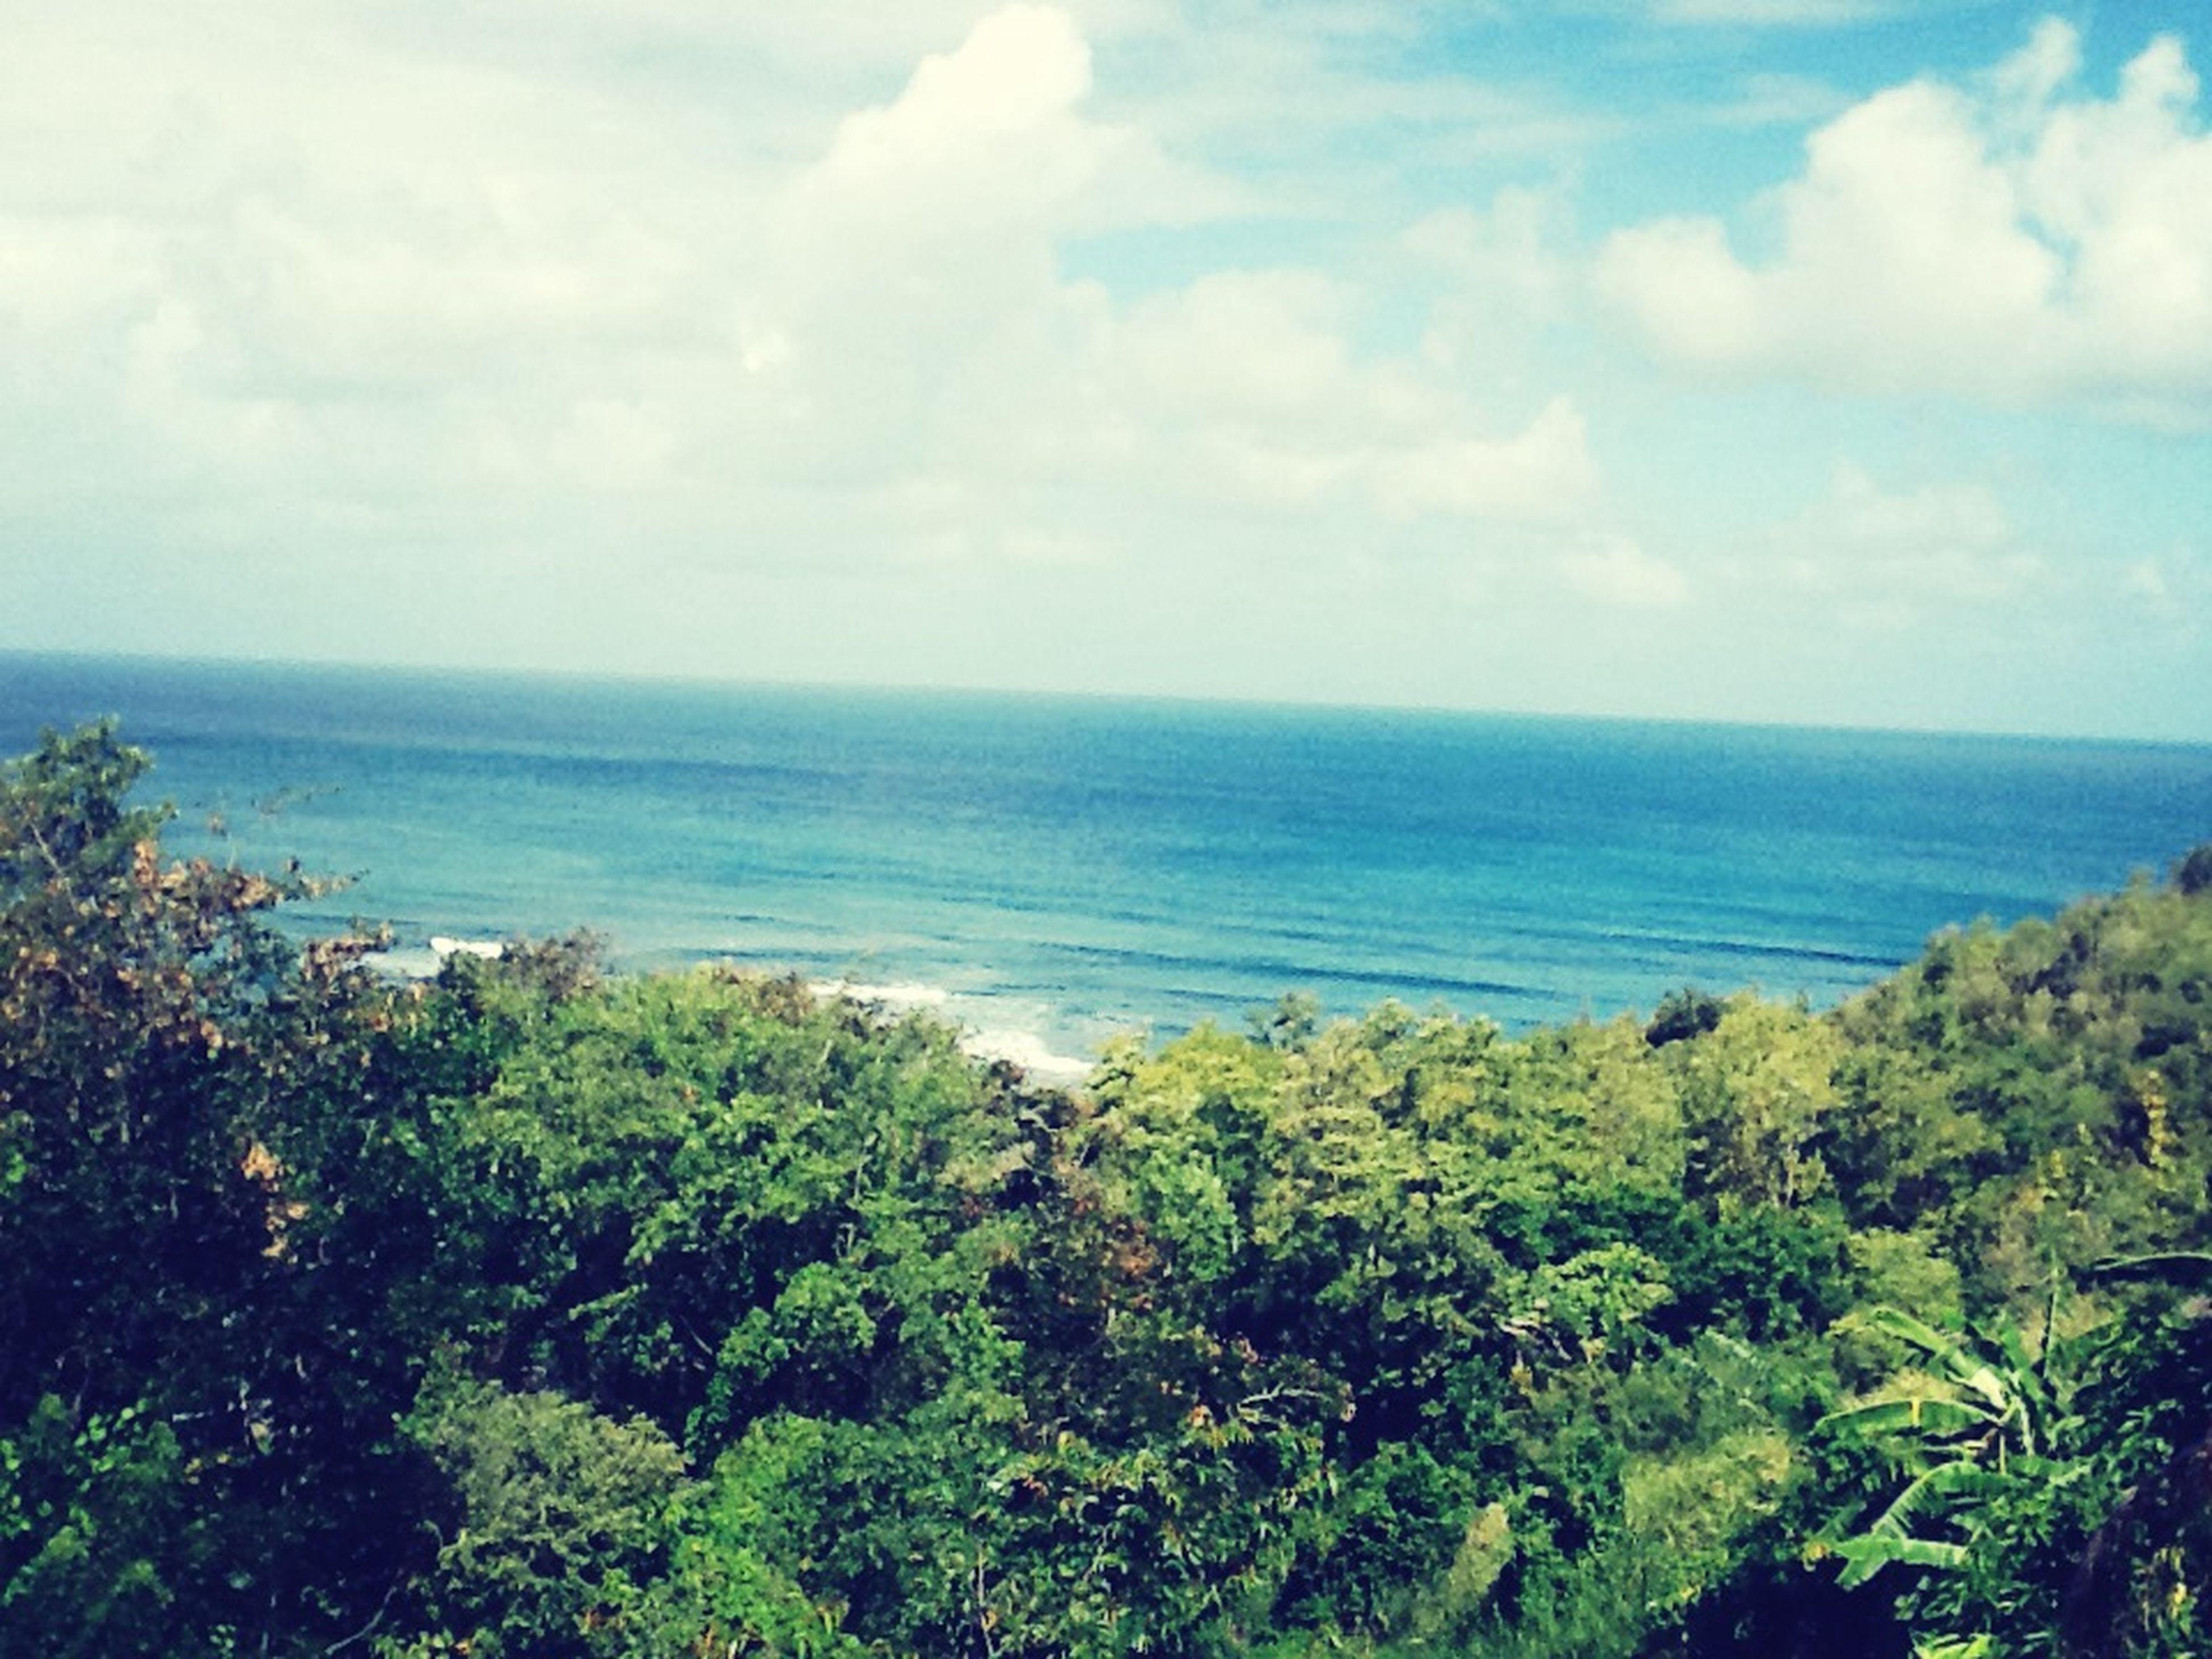 water, sea, scenics, tranquil scene, horizon over water, tranquility, beauty in nature, sky, tree, nature, beach, idyllic, shore, day, blue, outdoors, cloud, cloud - sky, coastline, non-urban scene